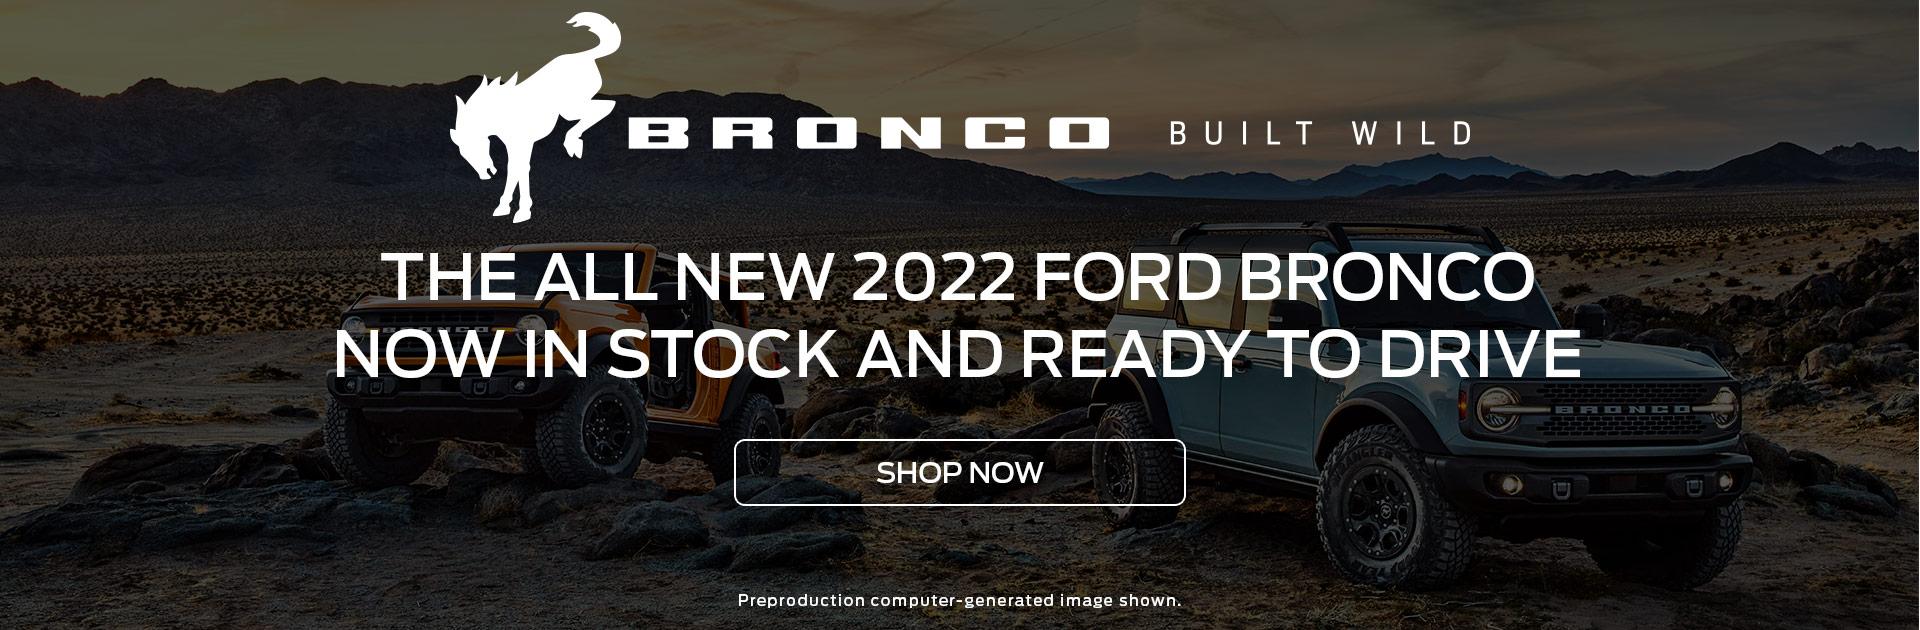 Bronco Now In Stock